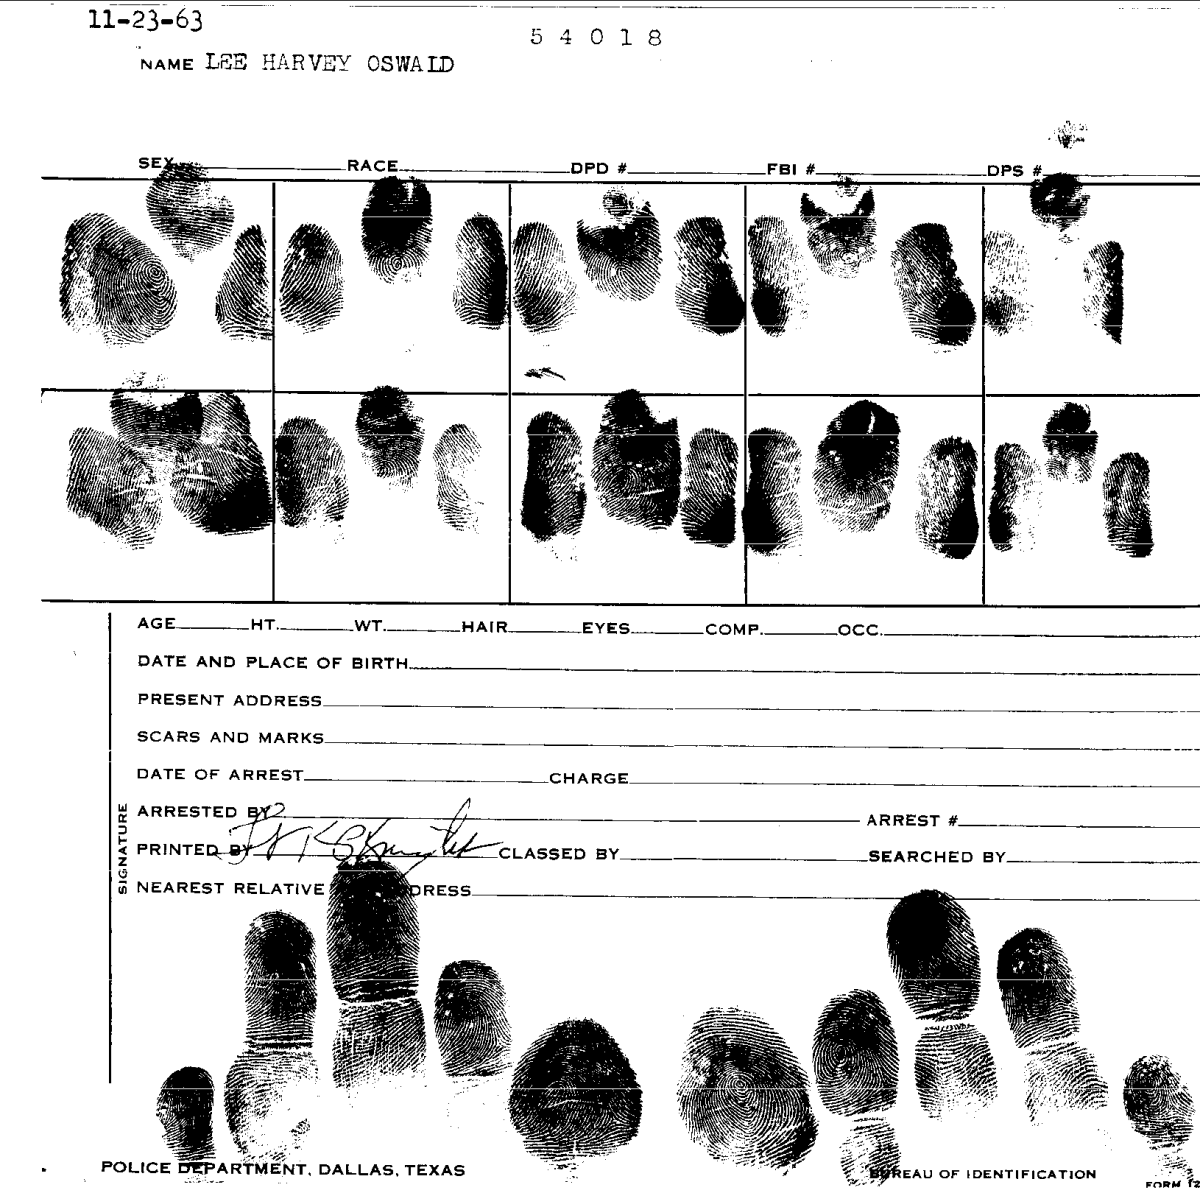 Oswald's Fingerprints